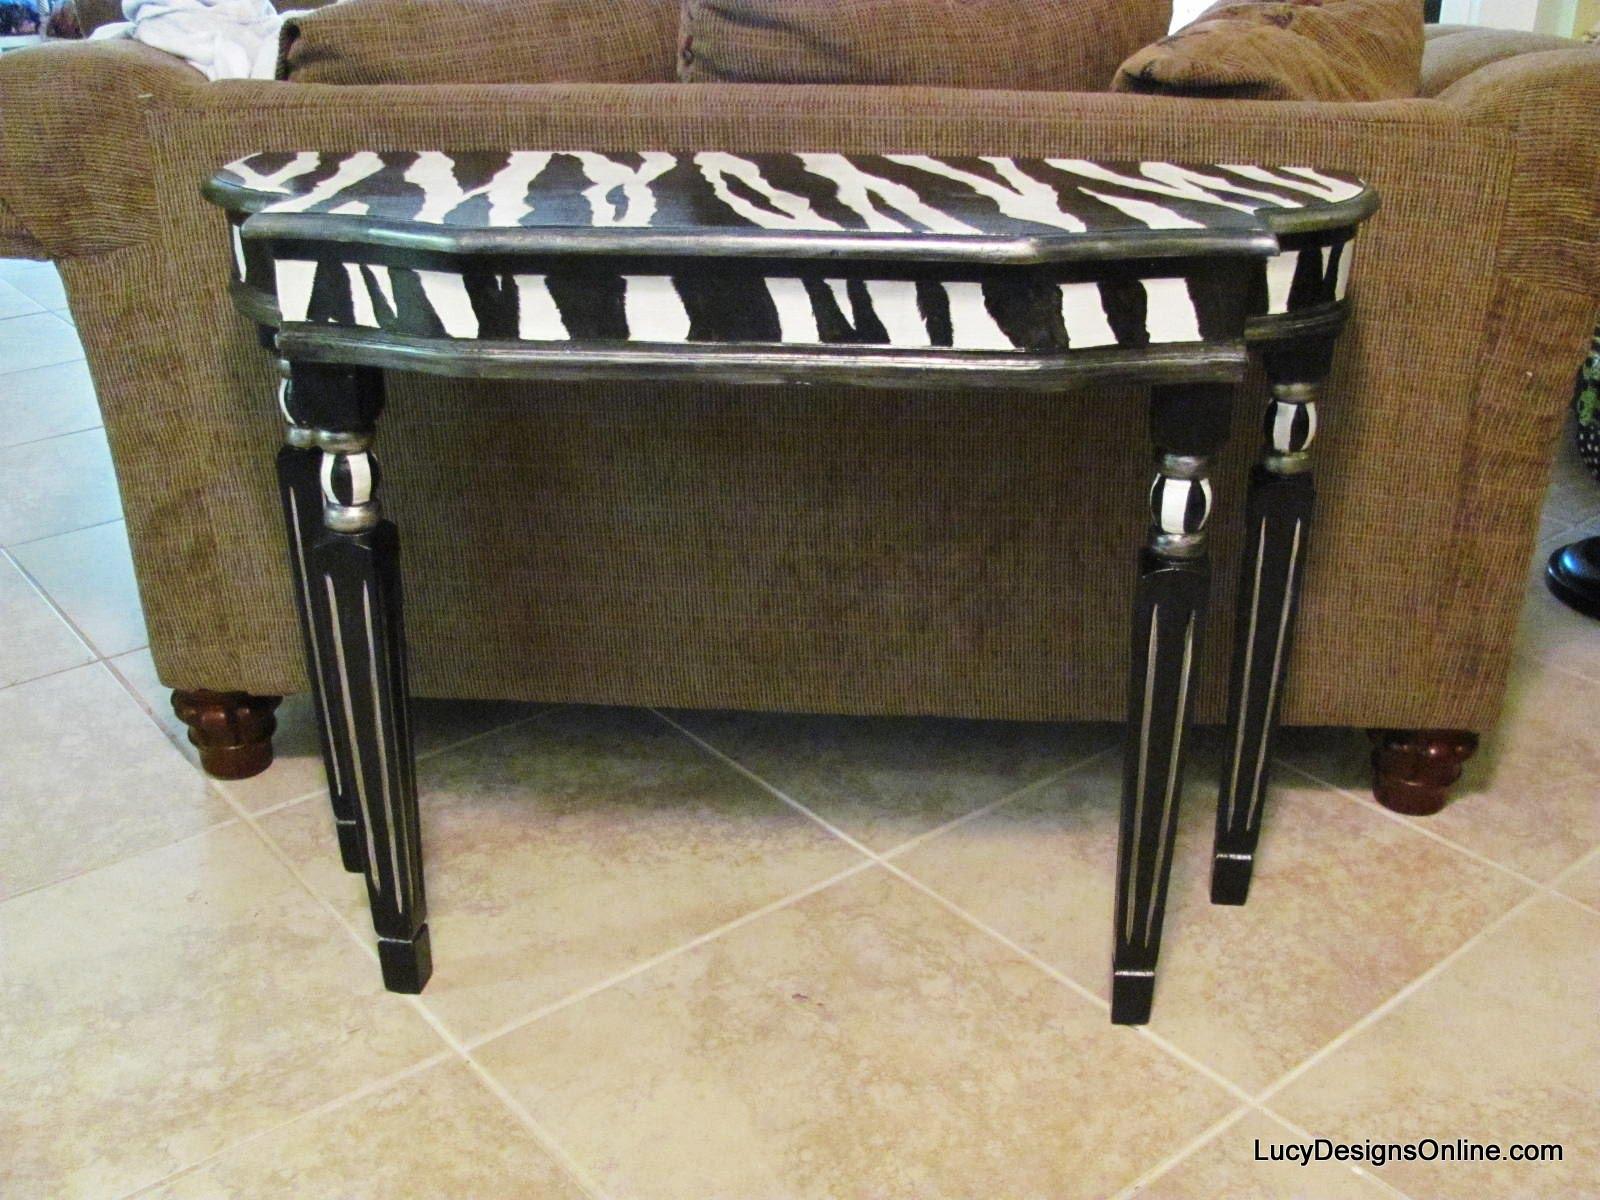 Sophisticated Zebra Print Table Setting Images - Best Image Engine ...